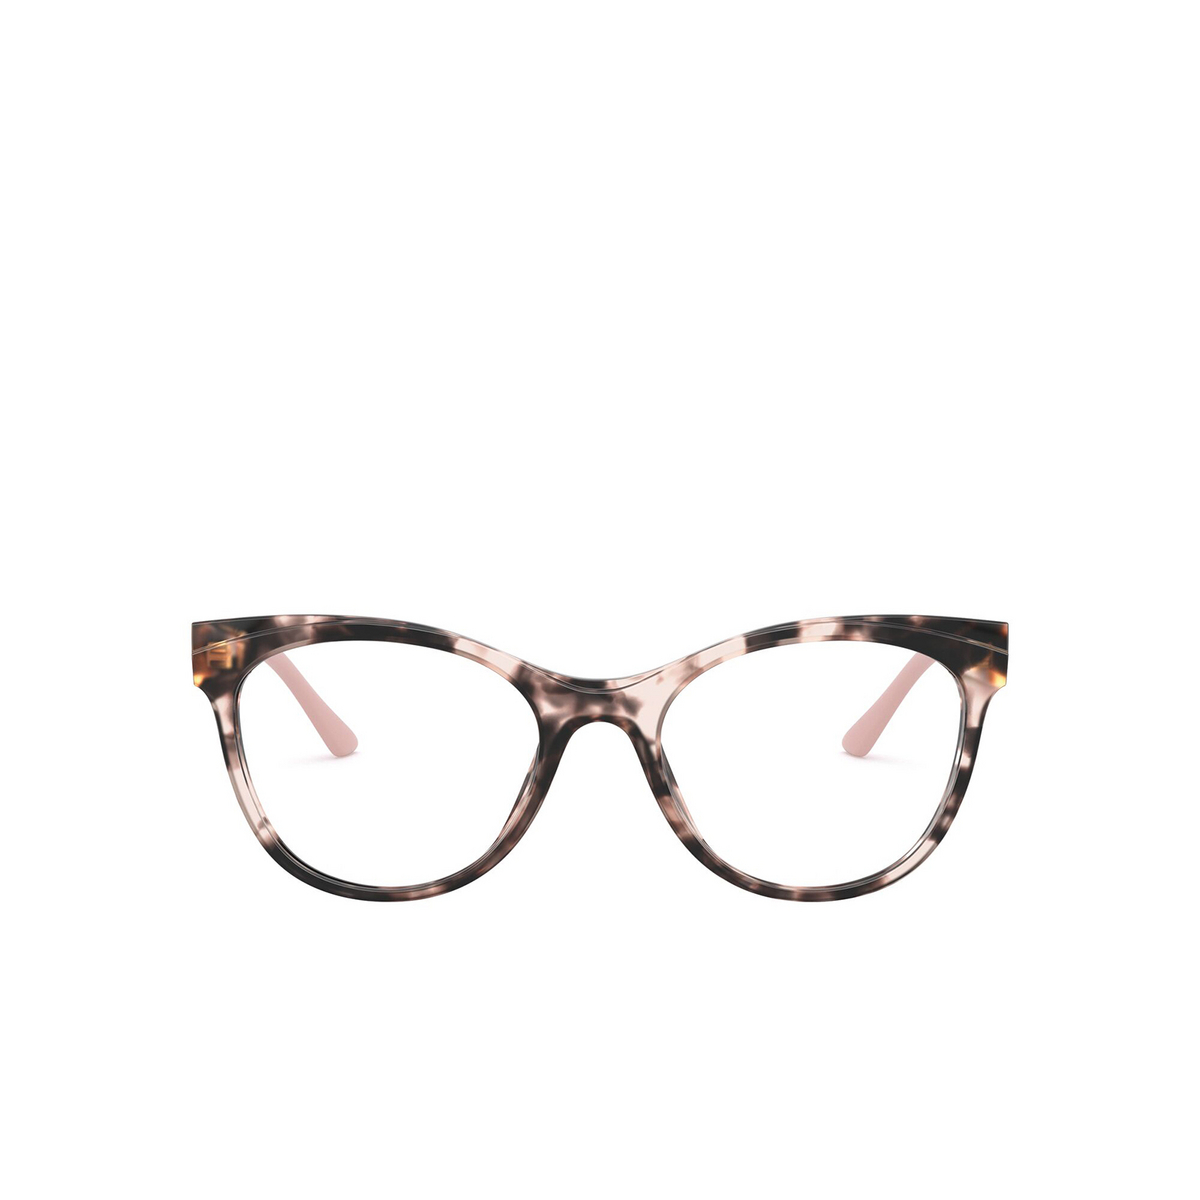 Prada® Butterfly Eyeglasses: PR 05WV color Pink Havana ROJ1O1 - front view.